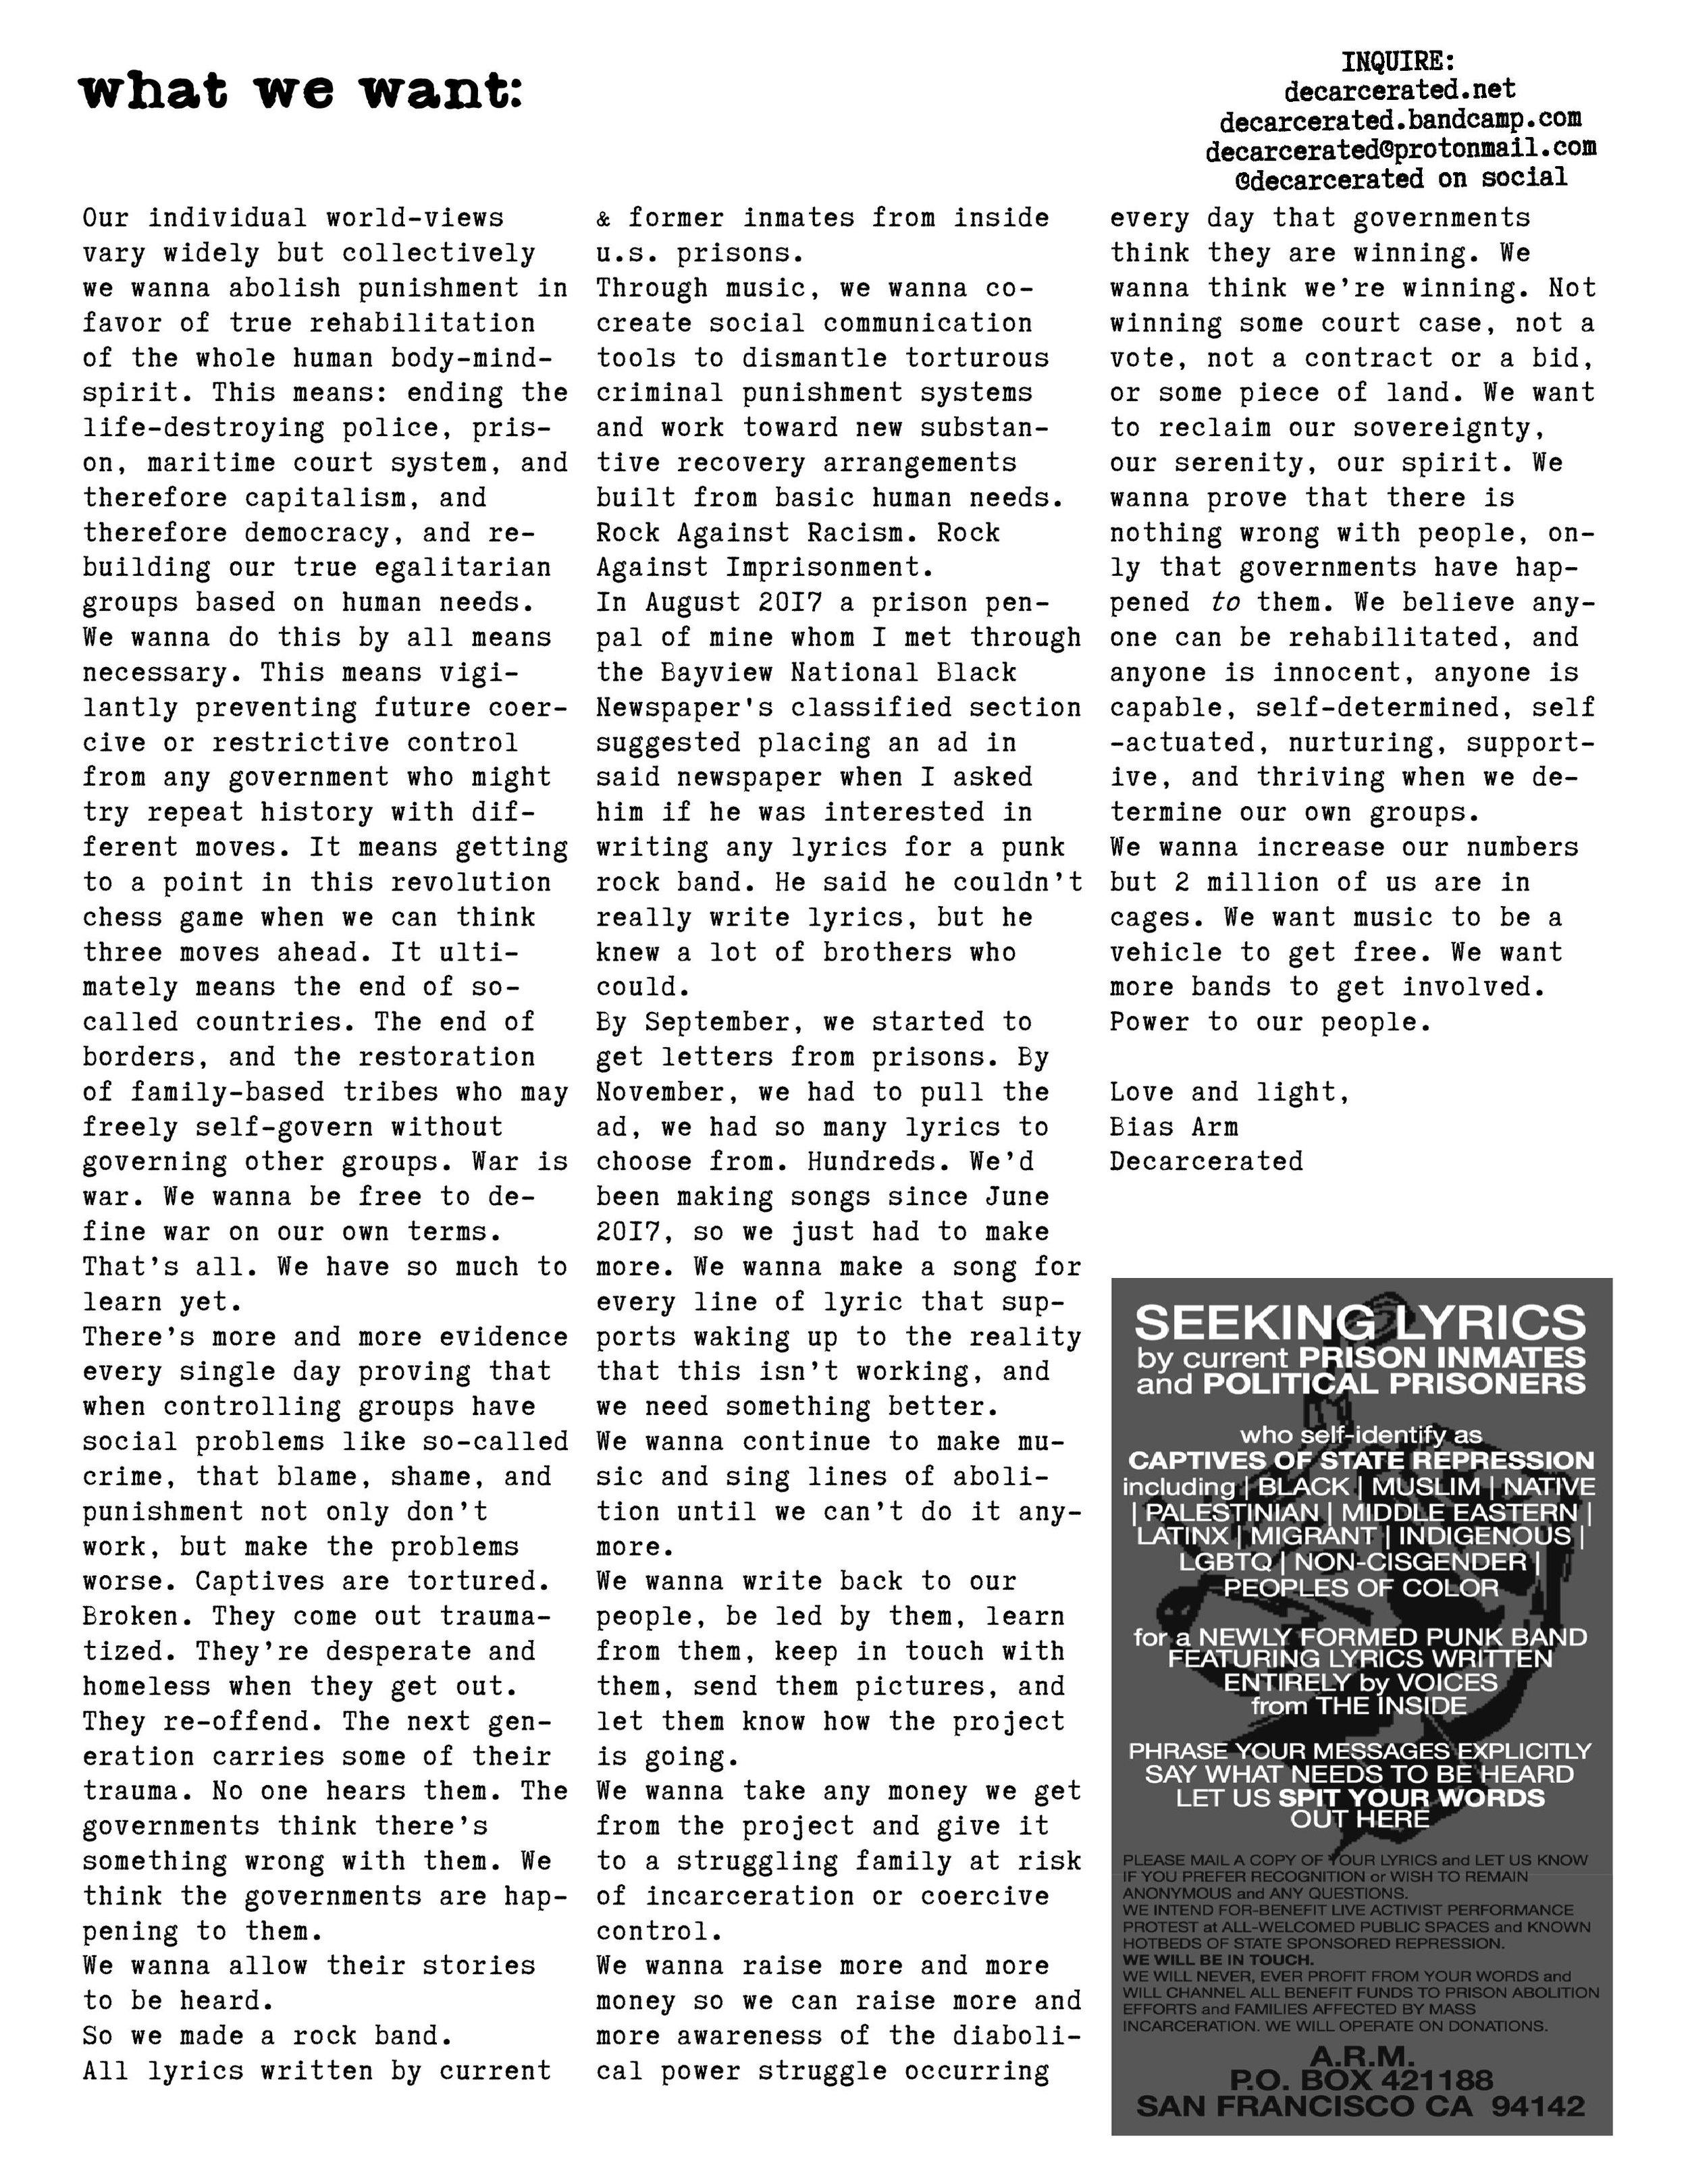 SLFH_vol_1-page-004.jpg